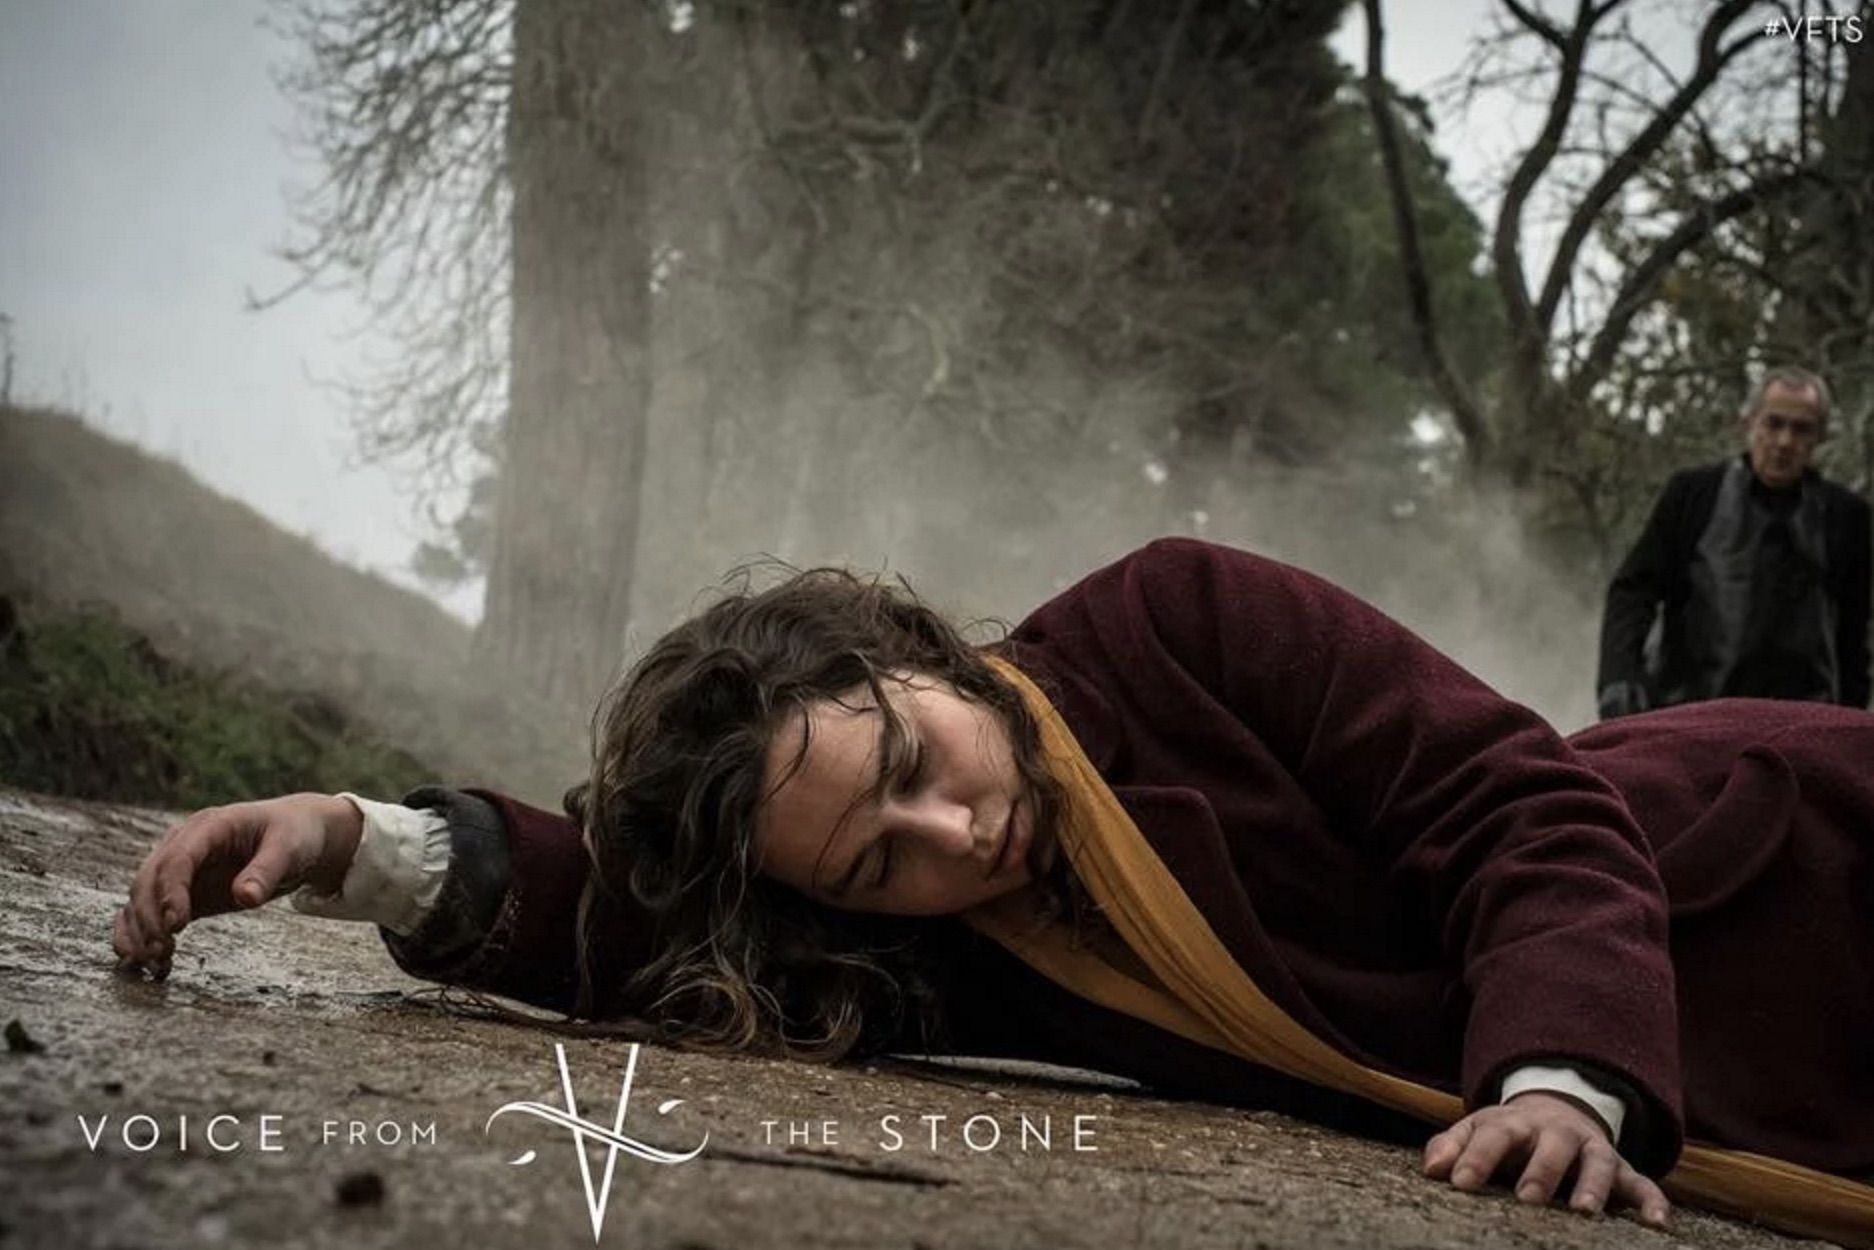 Imagen 2 de Voice From the Stone